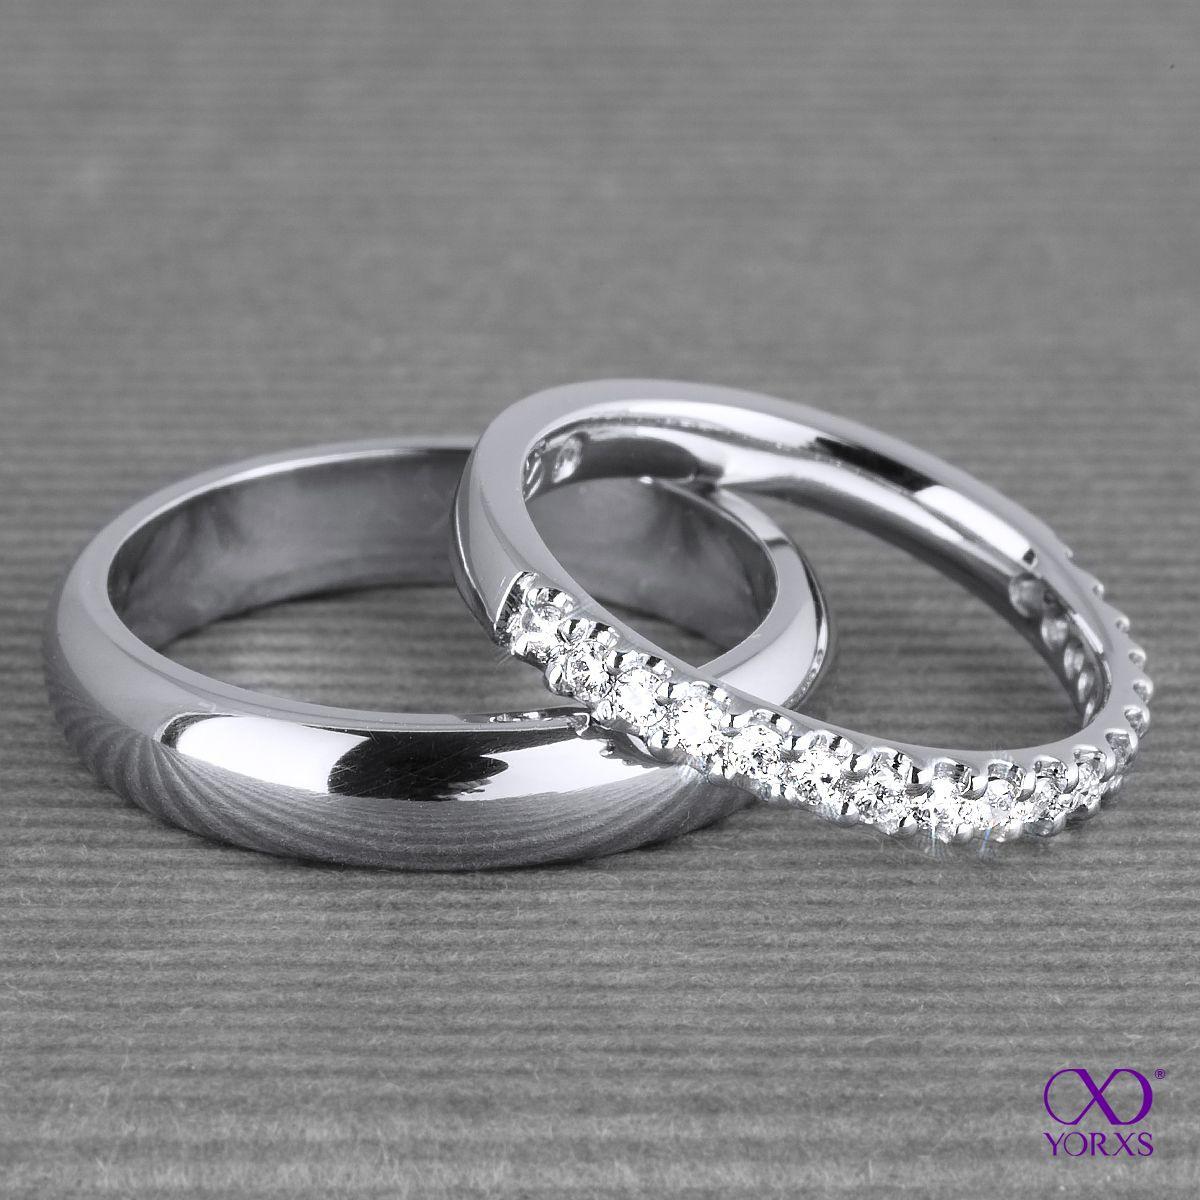 Eheringe - Ringe Online Kaufen | Eheringe, Ring Verlobung